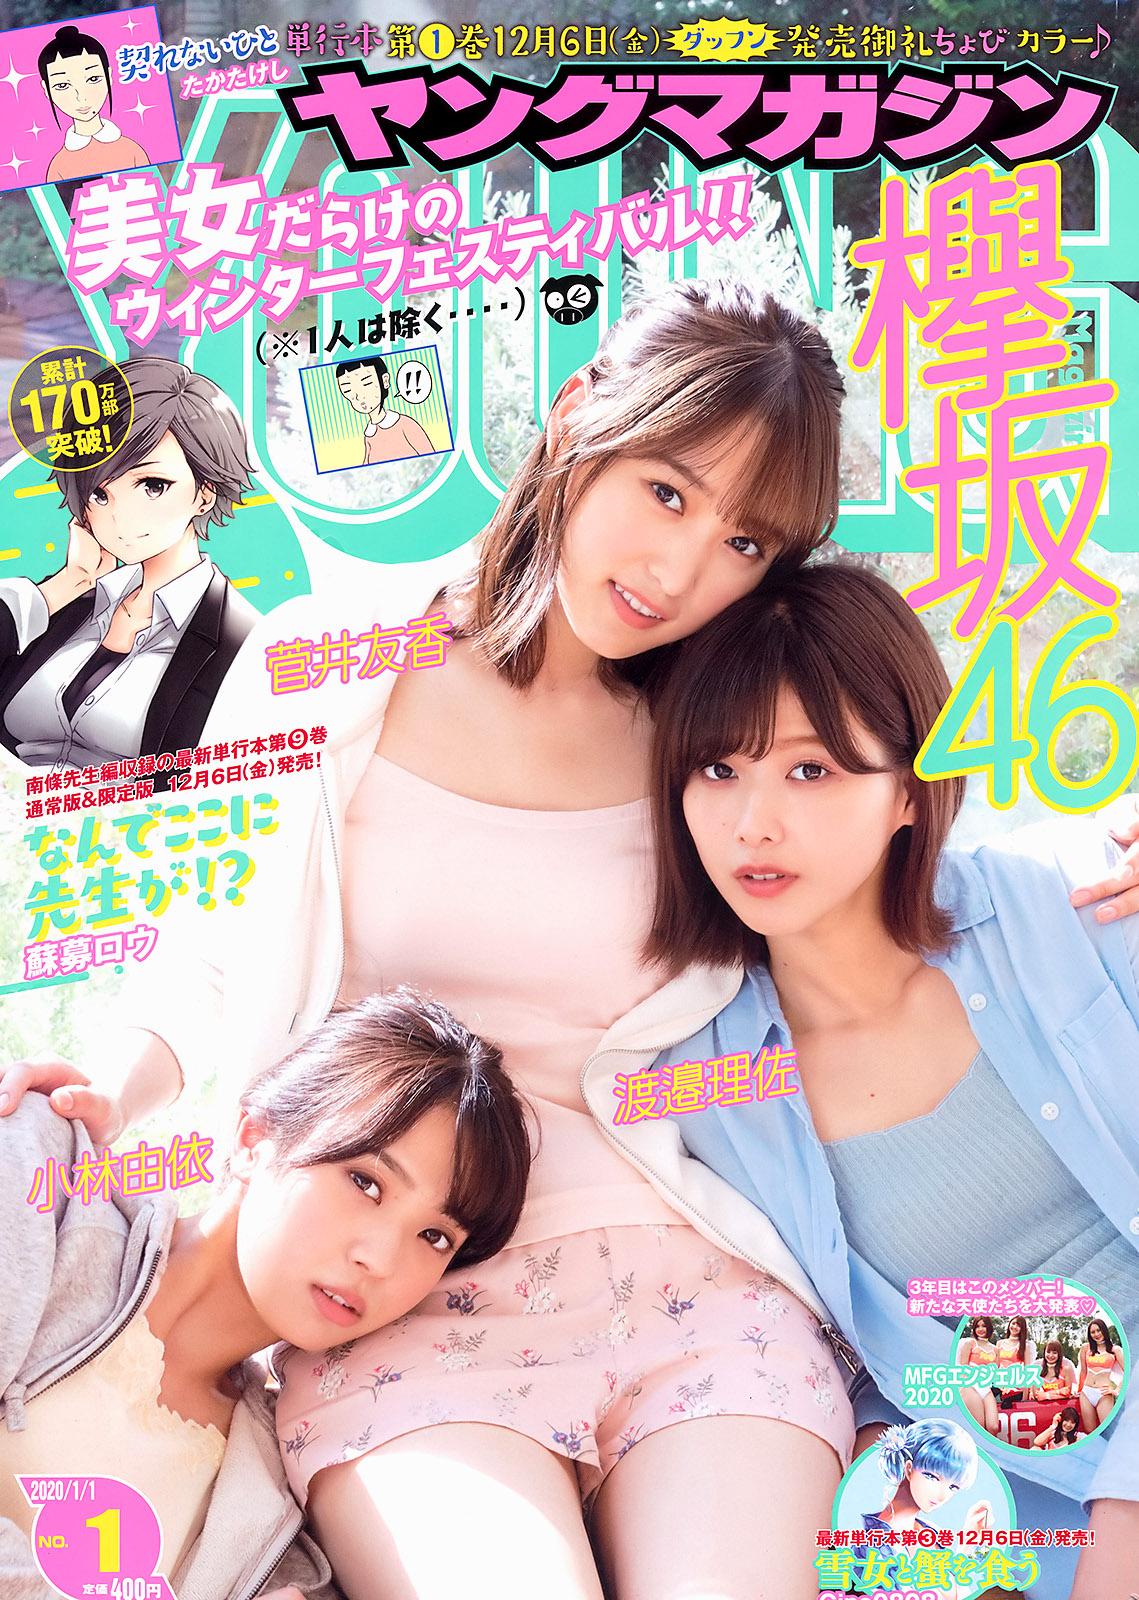 K46 Young Magazine 200101 01.jpg